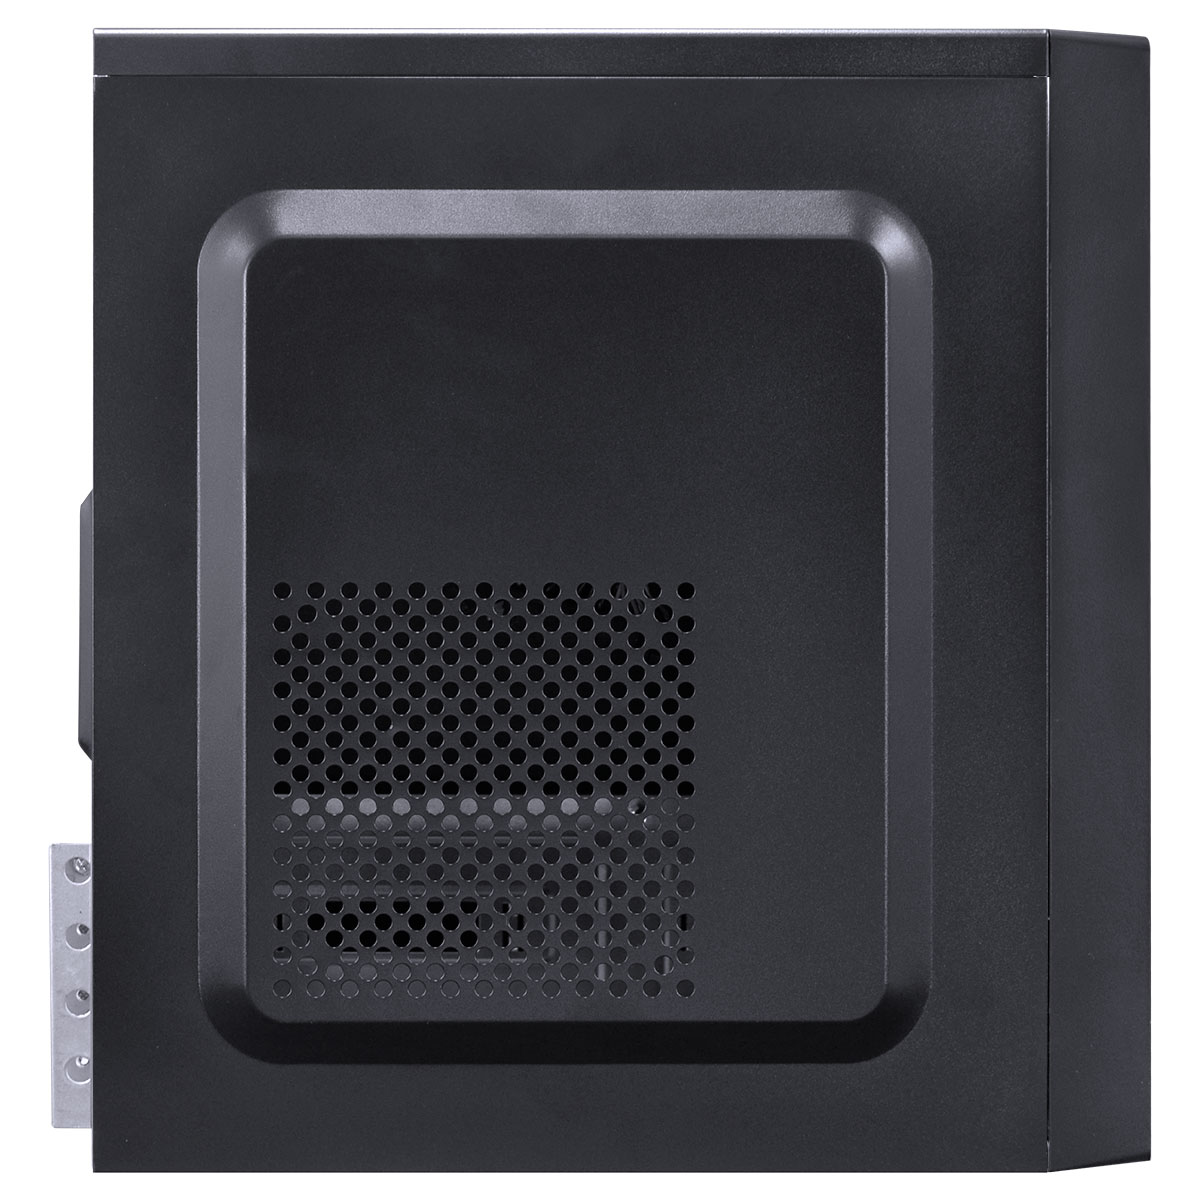 COMPUTADOR HOME H100 - CELERON DUAL CORE J4005 2.00GHZ 4GB DDR4 HD 500GB 4XUSB 3.0 2X USB 2.0 FONTE 200W